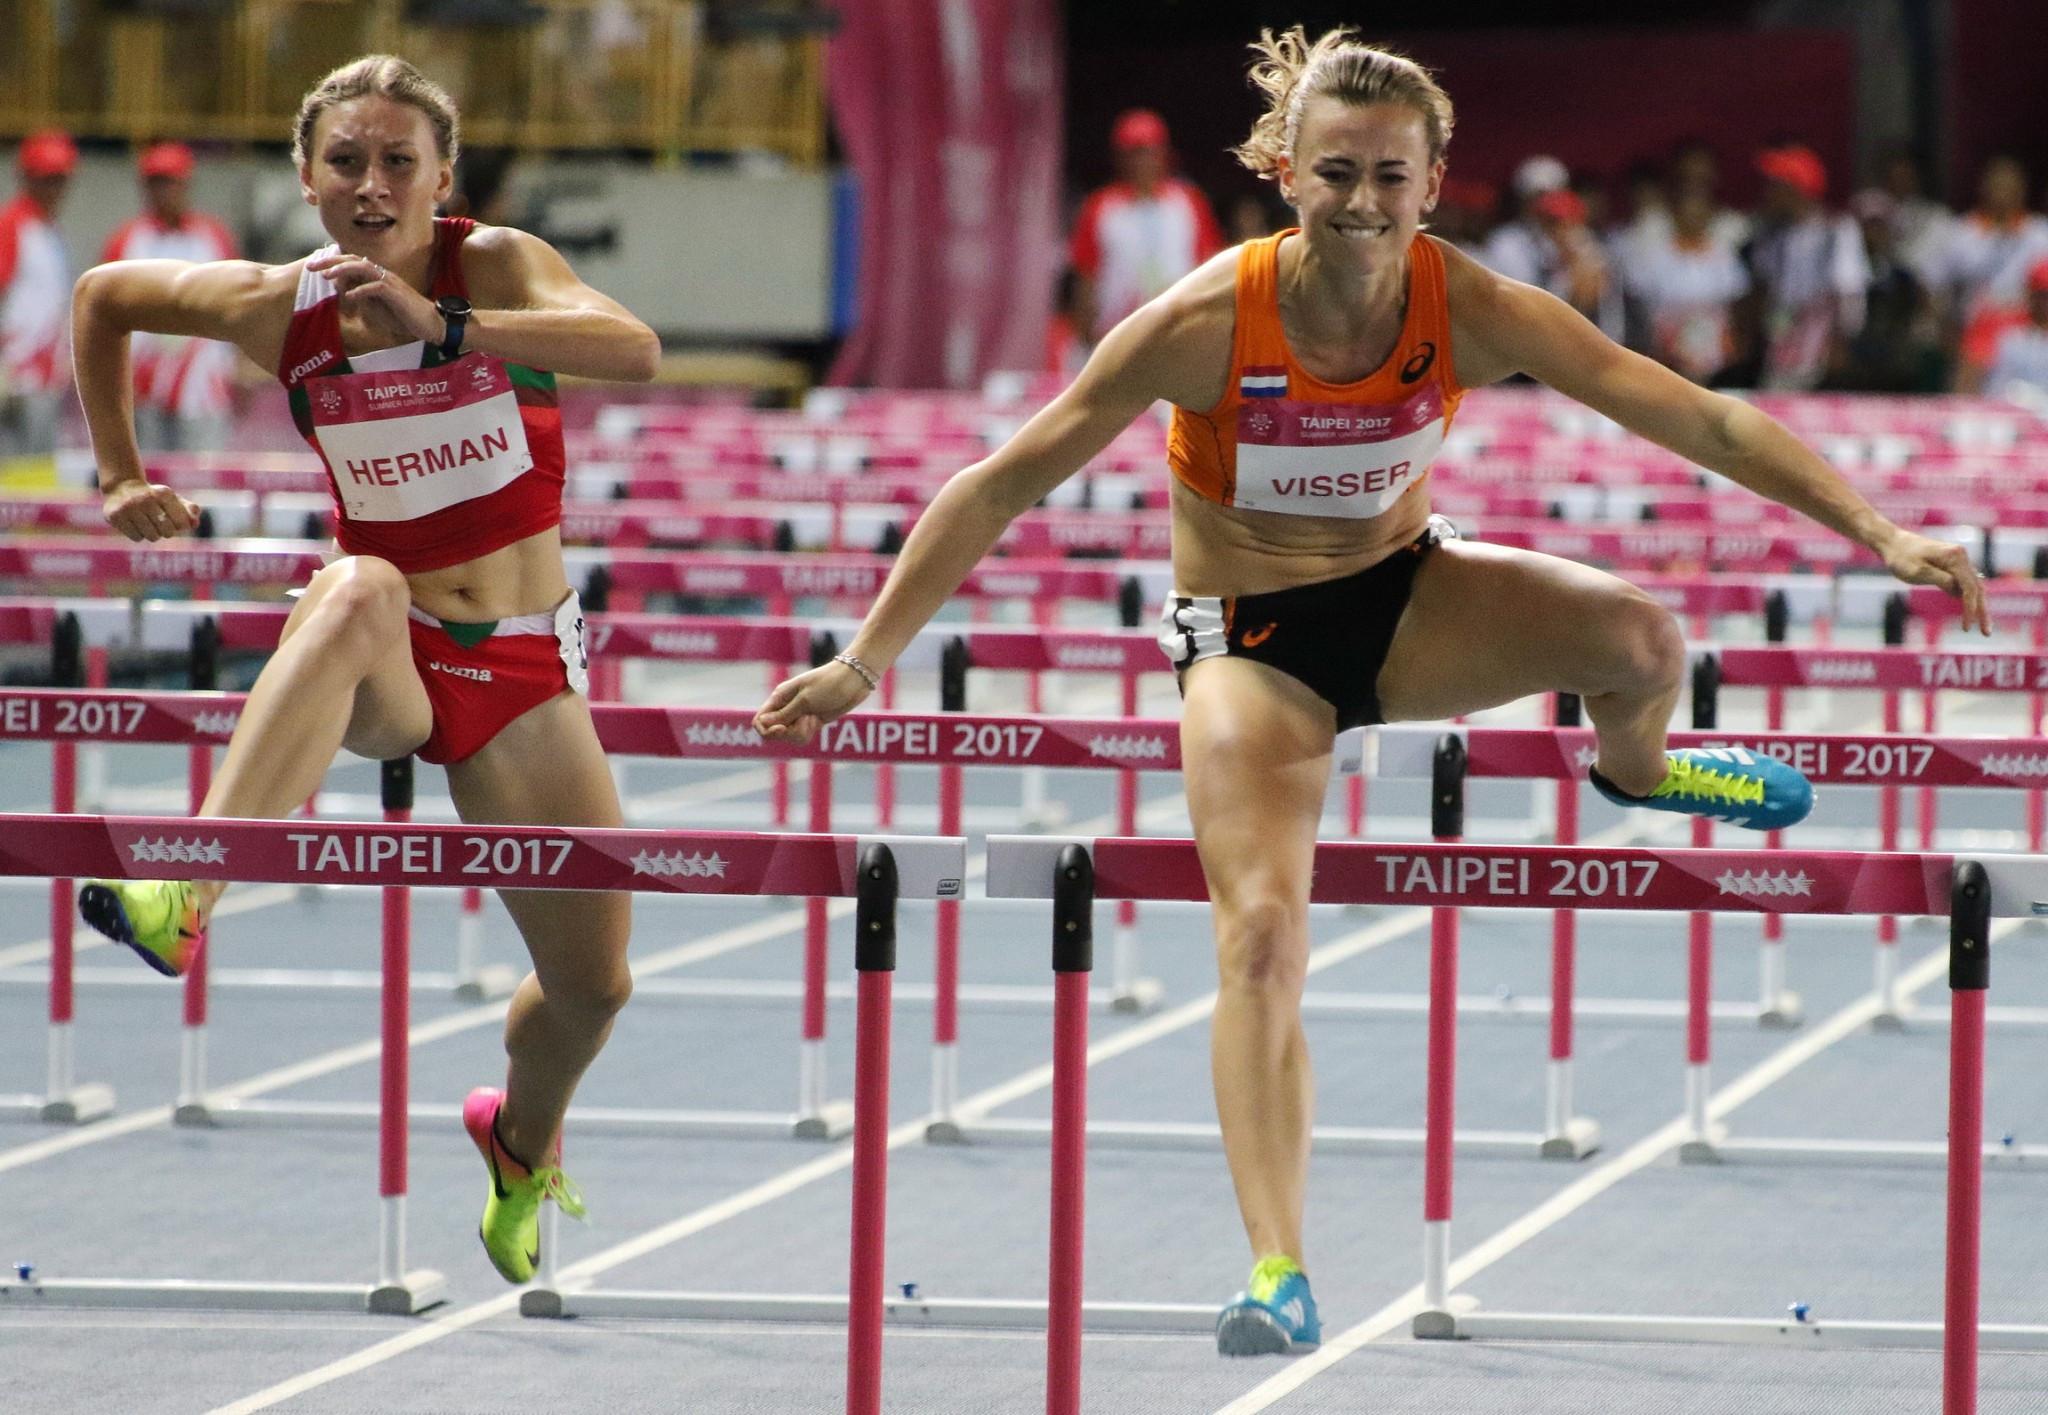 Nadine Visser claimed the 100m hurdles title in impressive fashion ©Taipei 2017